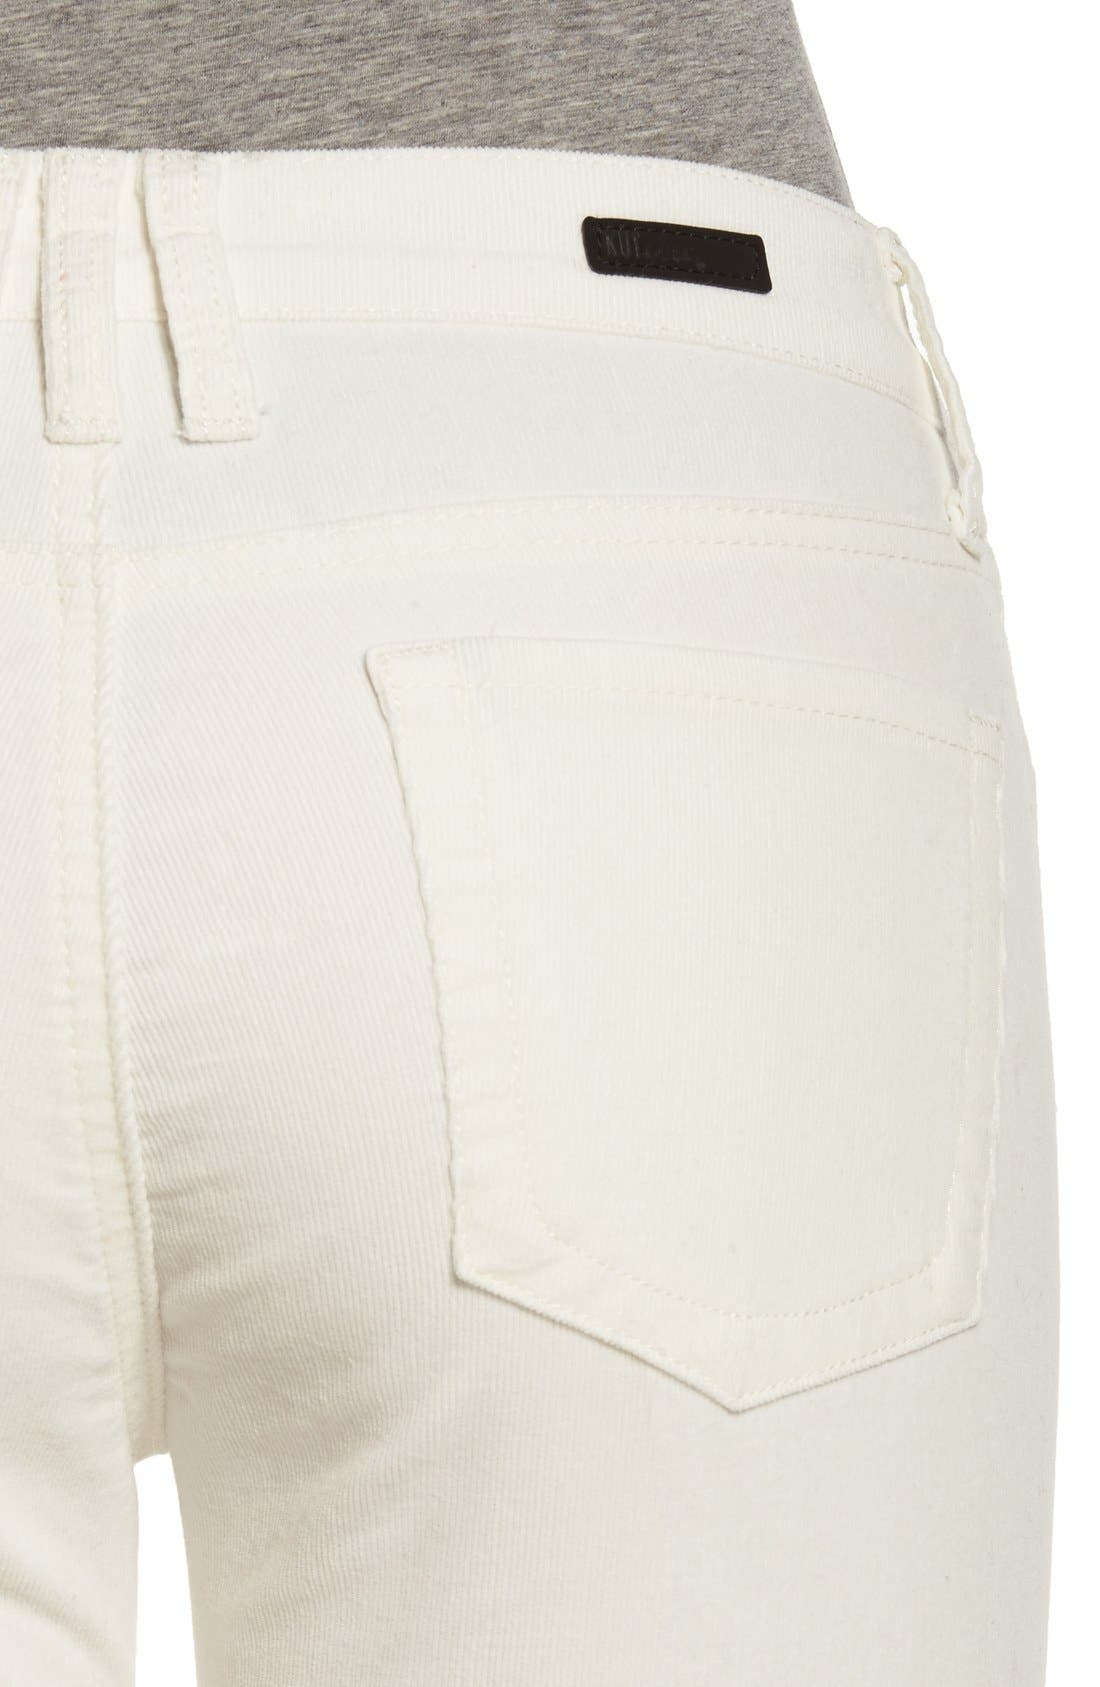 'Diana' Stretch Corduroy Skinny Pants,                             Alternate thumbnail 154, color,